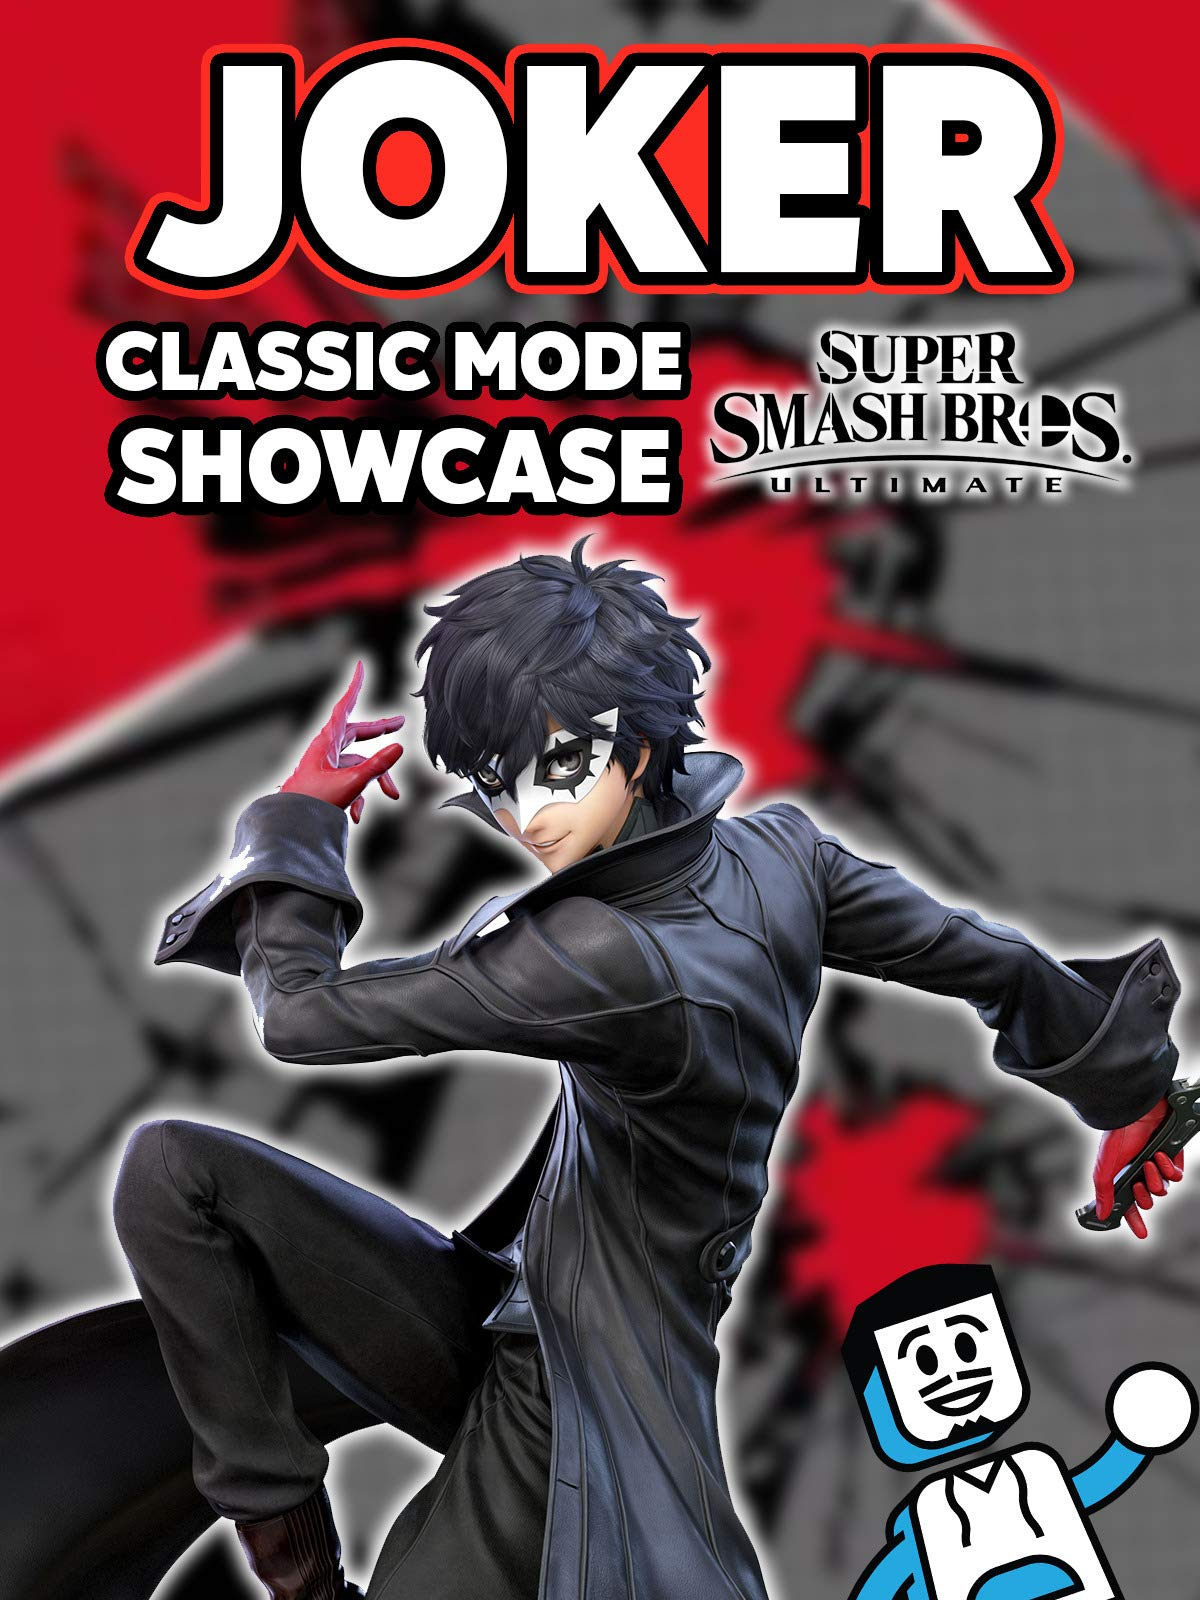 Clip: Joker Classic Mode Showcase in Super Smash Bros Ultimate